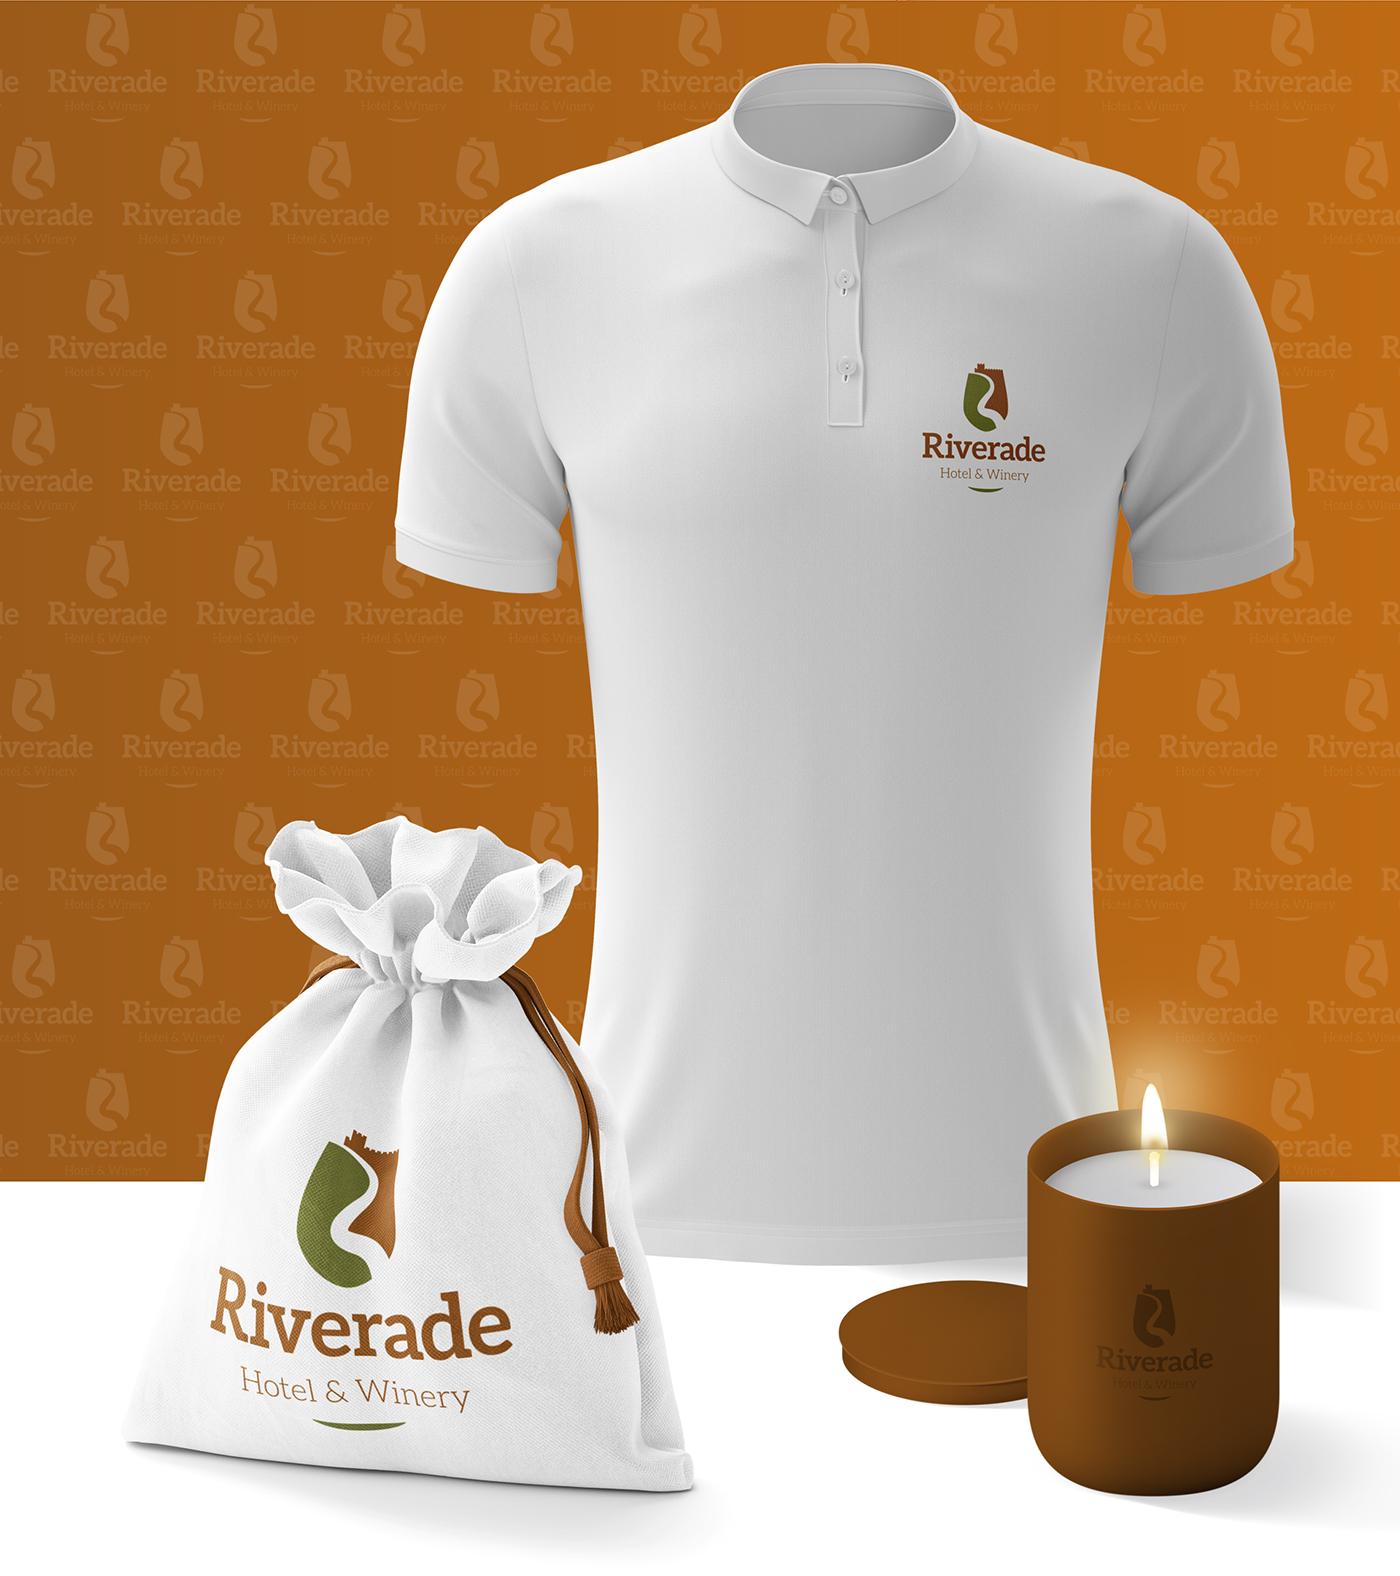 Wellness Brand Design elements with Riverade's Logo